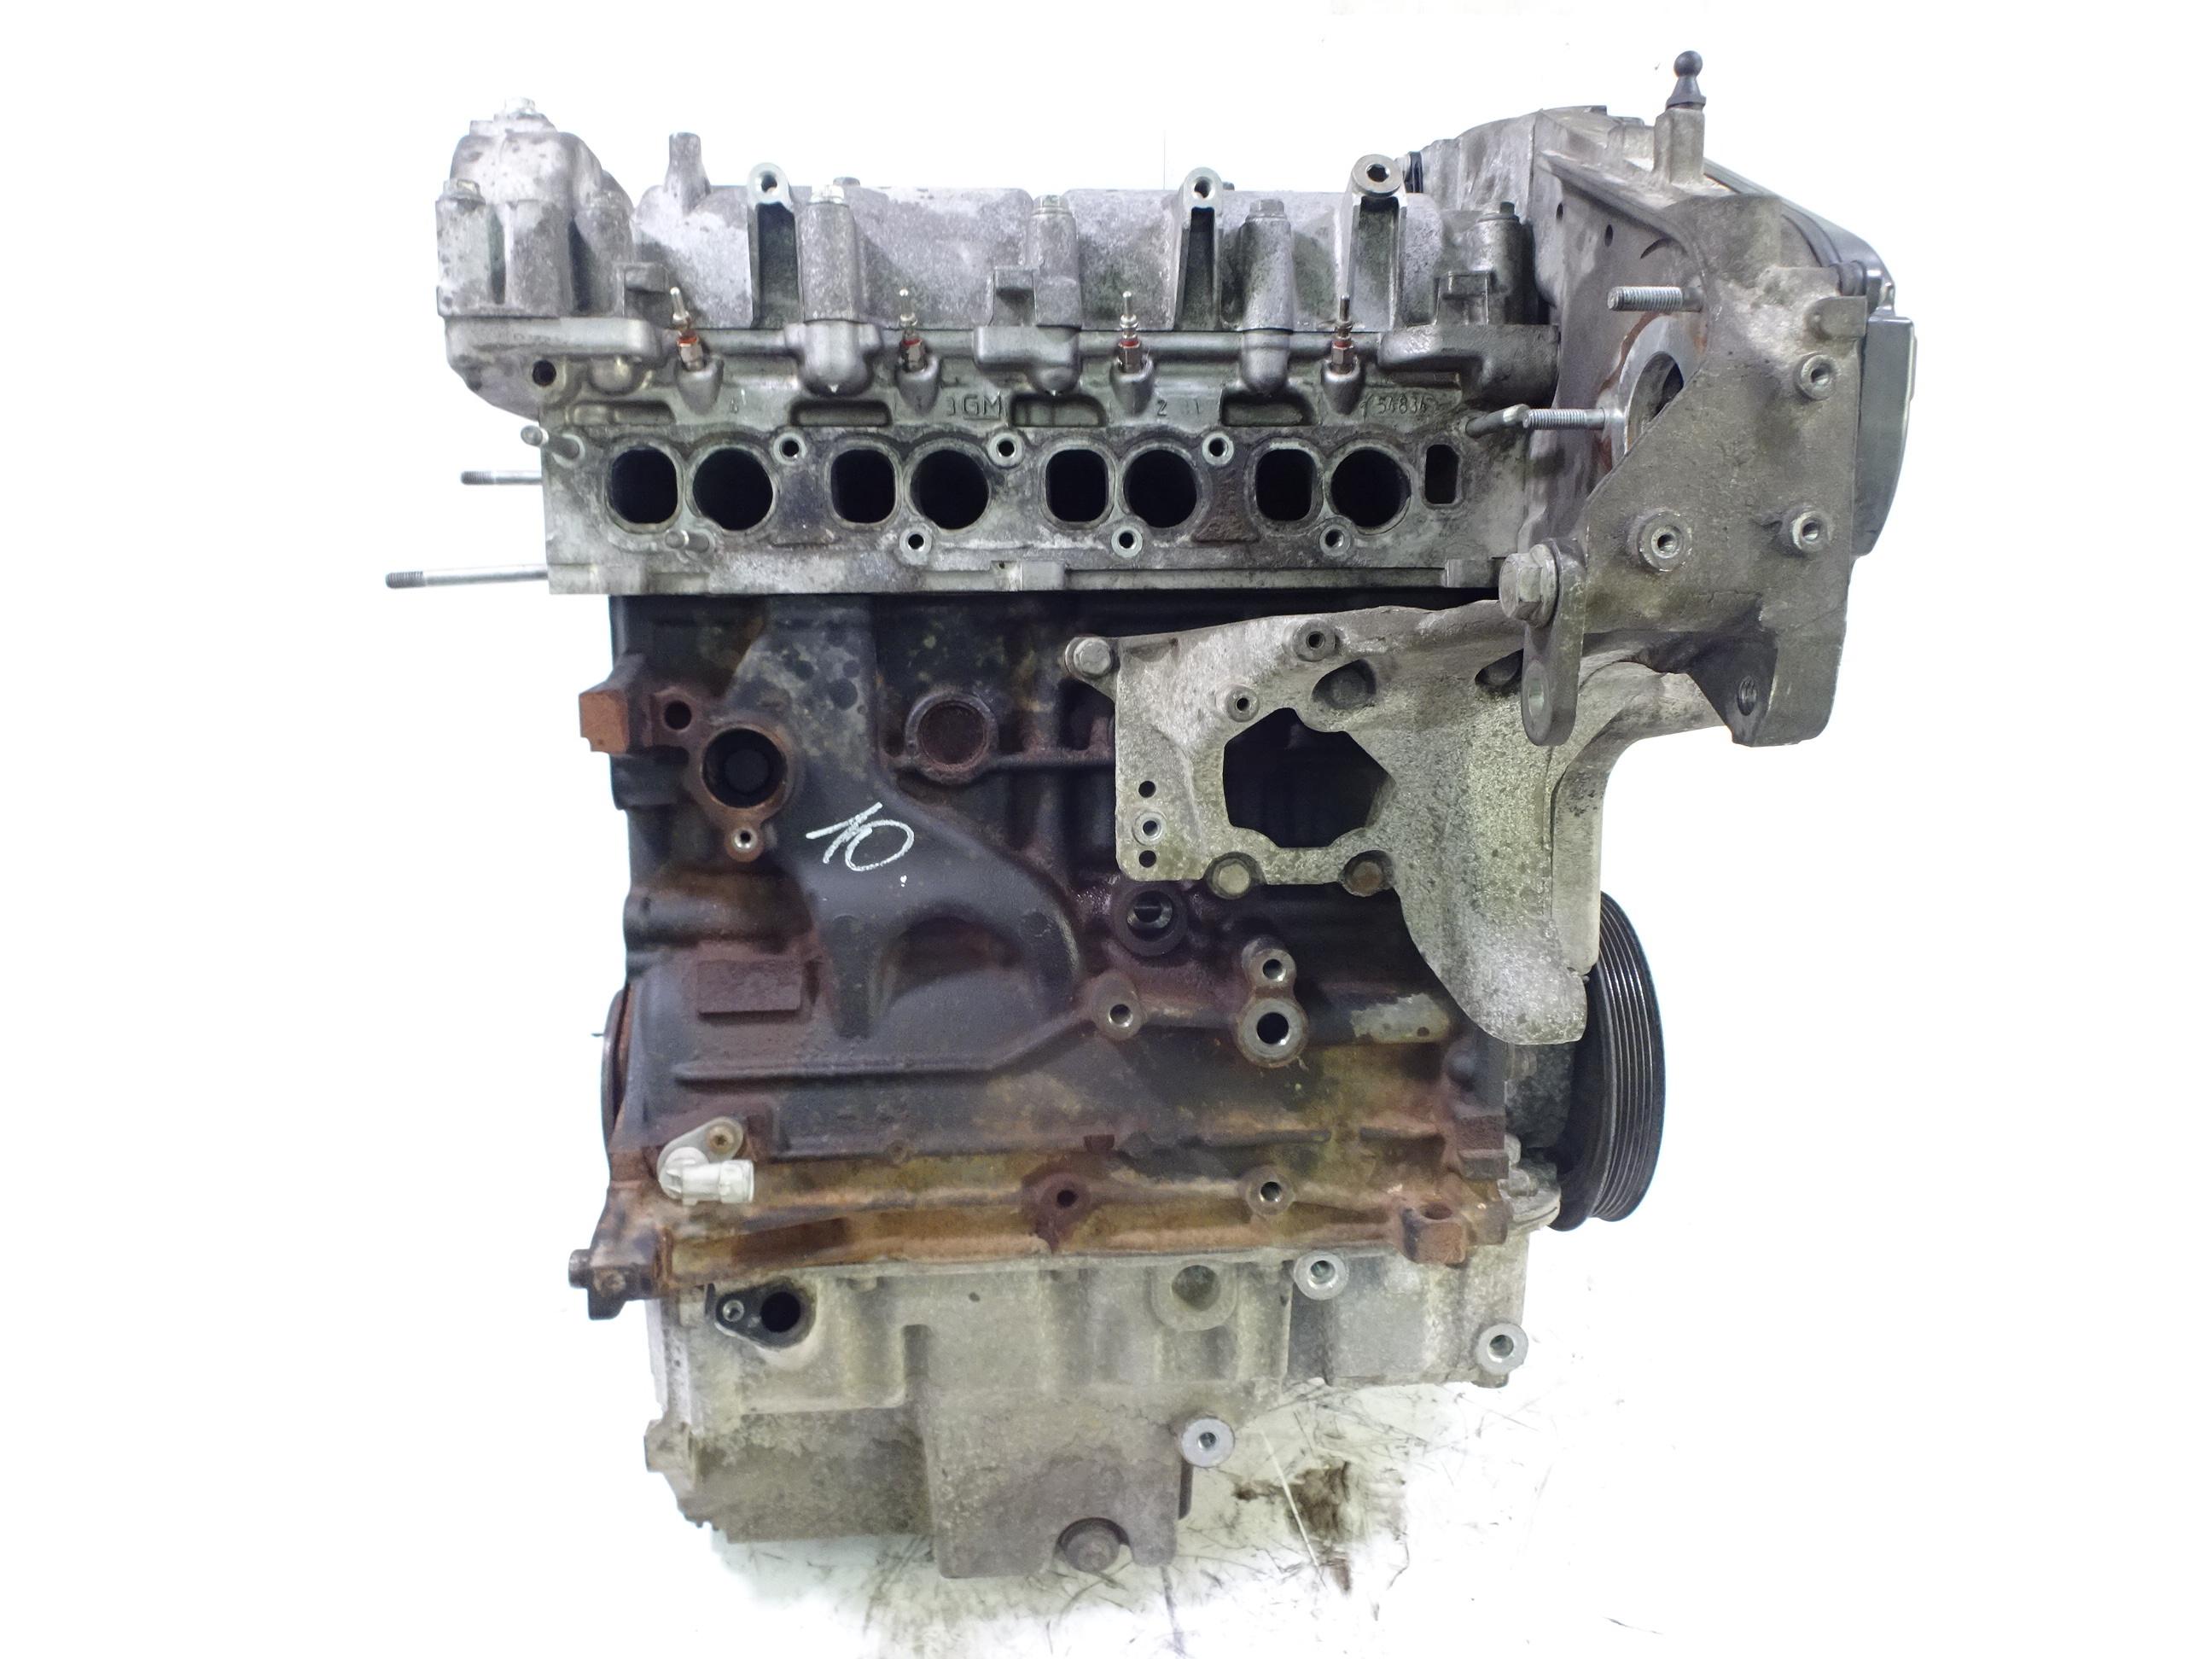 Motor 2015 Opel Insignia Zafira 2,0 CDTI Diesel A20DT